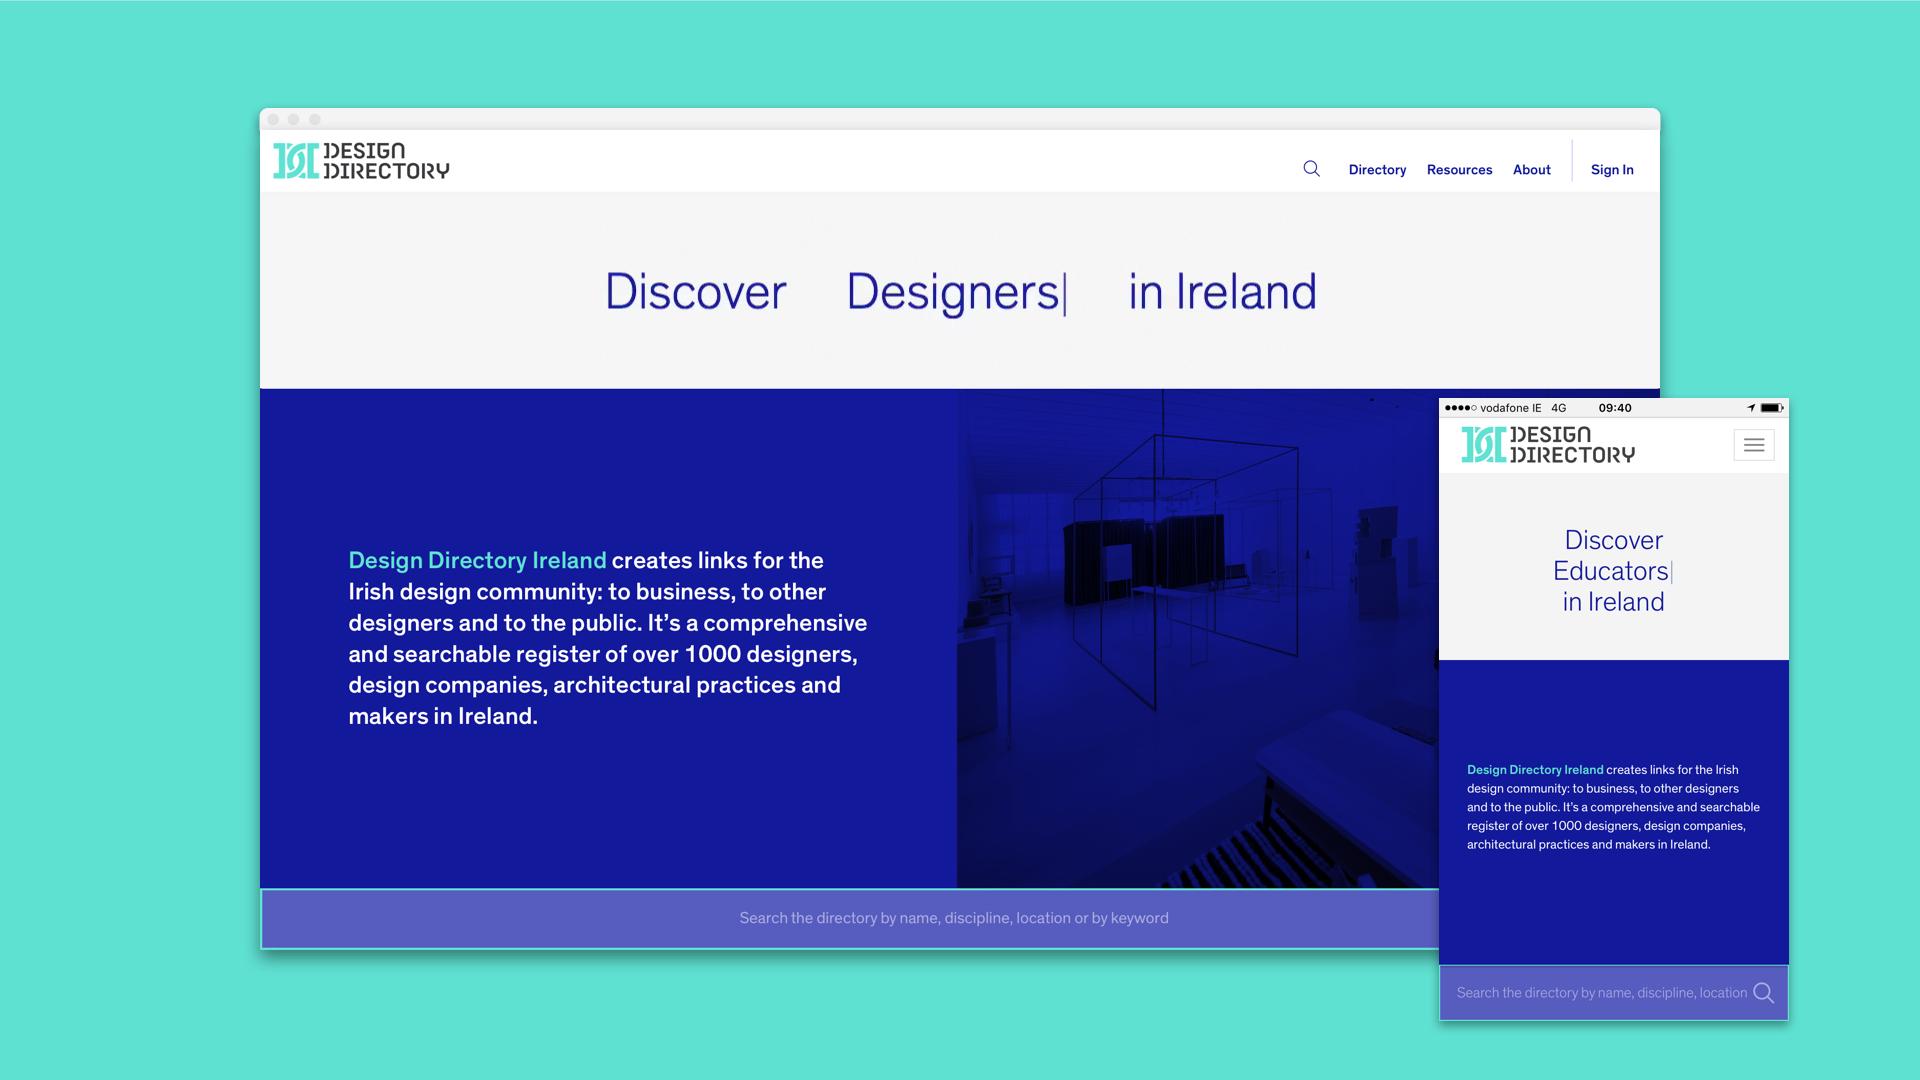 Cover image: Design Directory Ireland